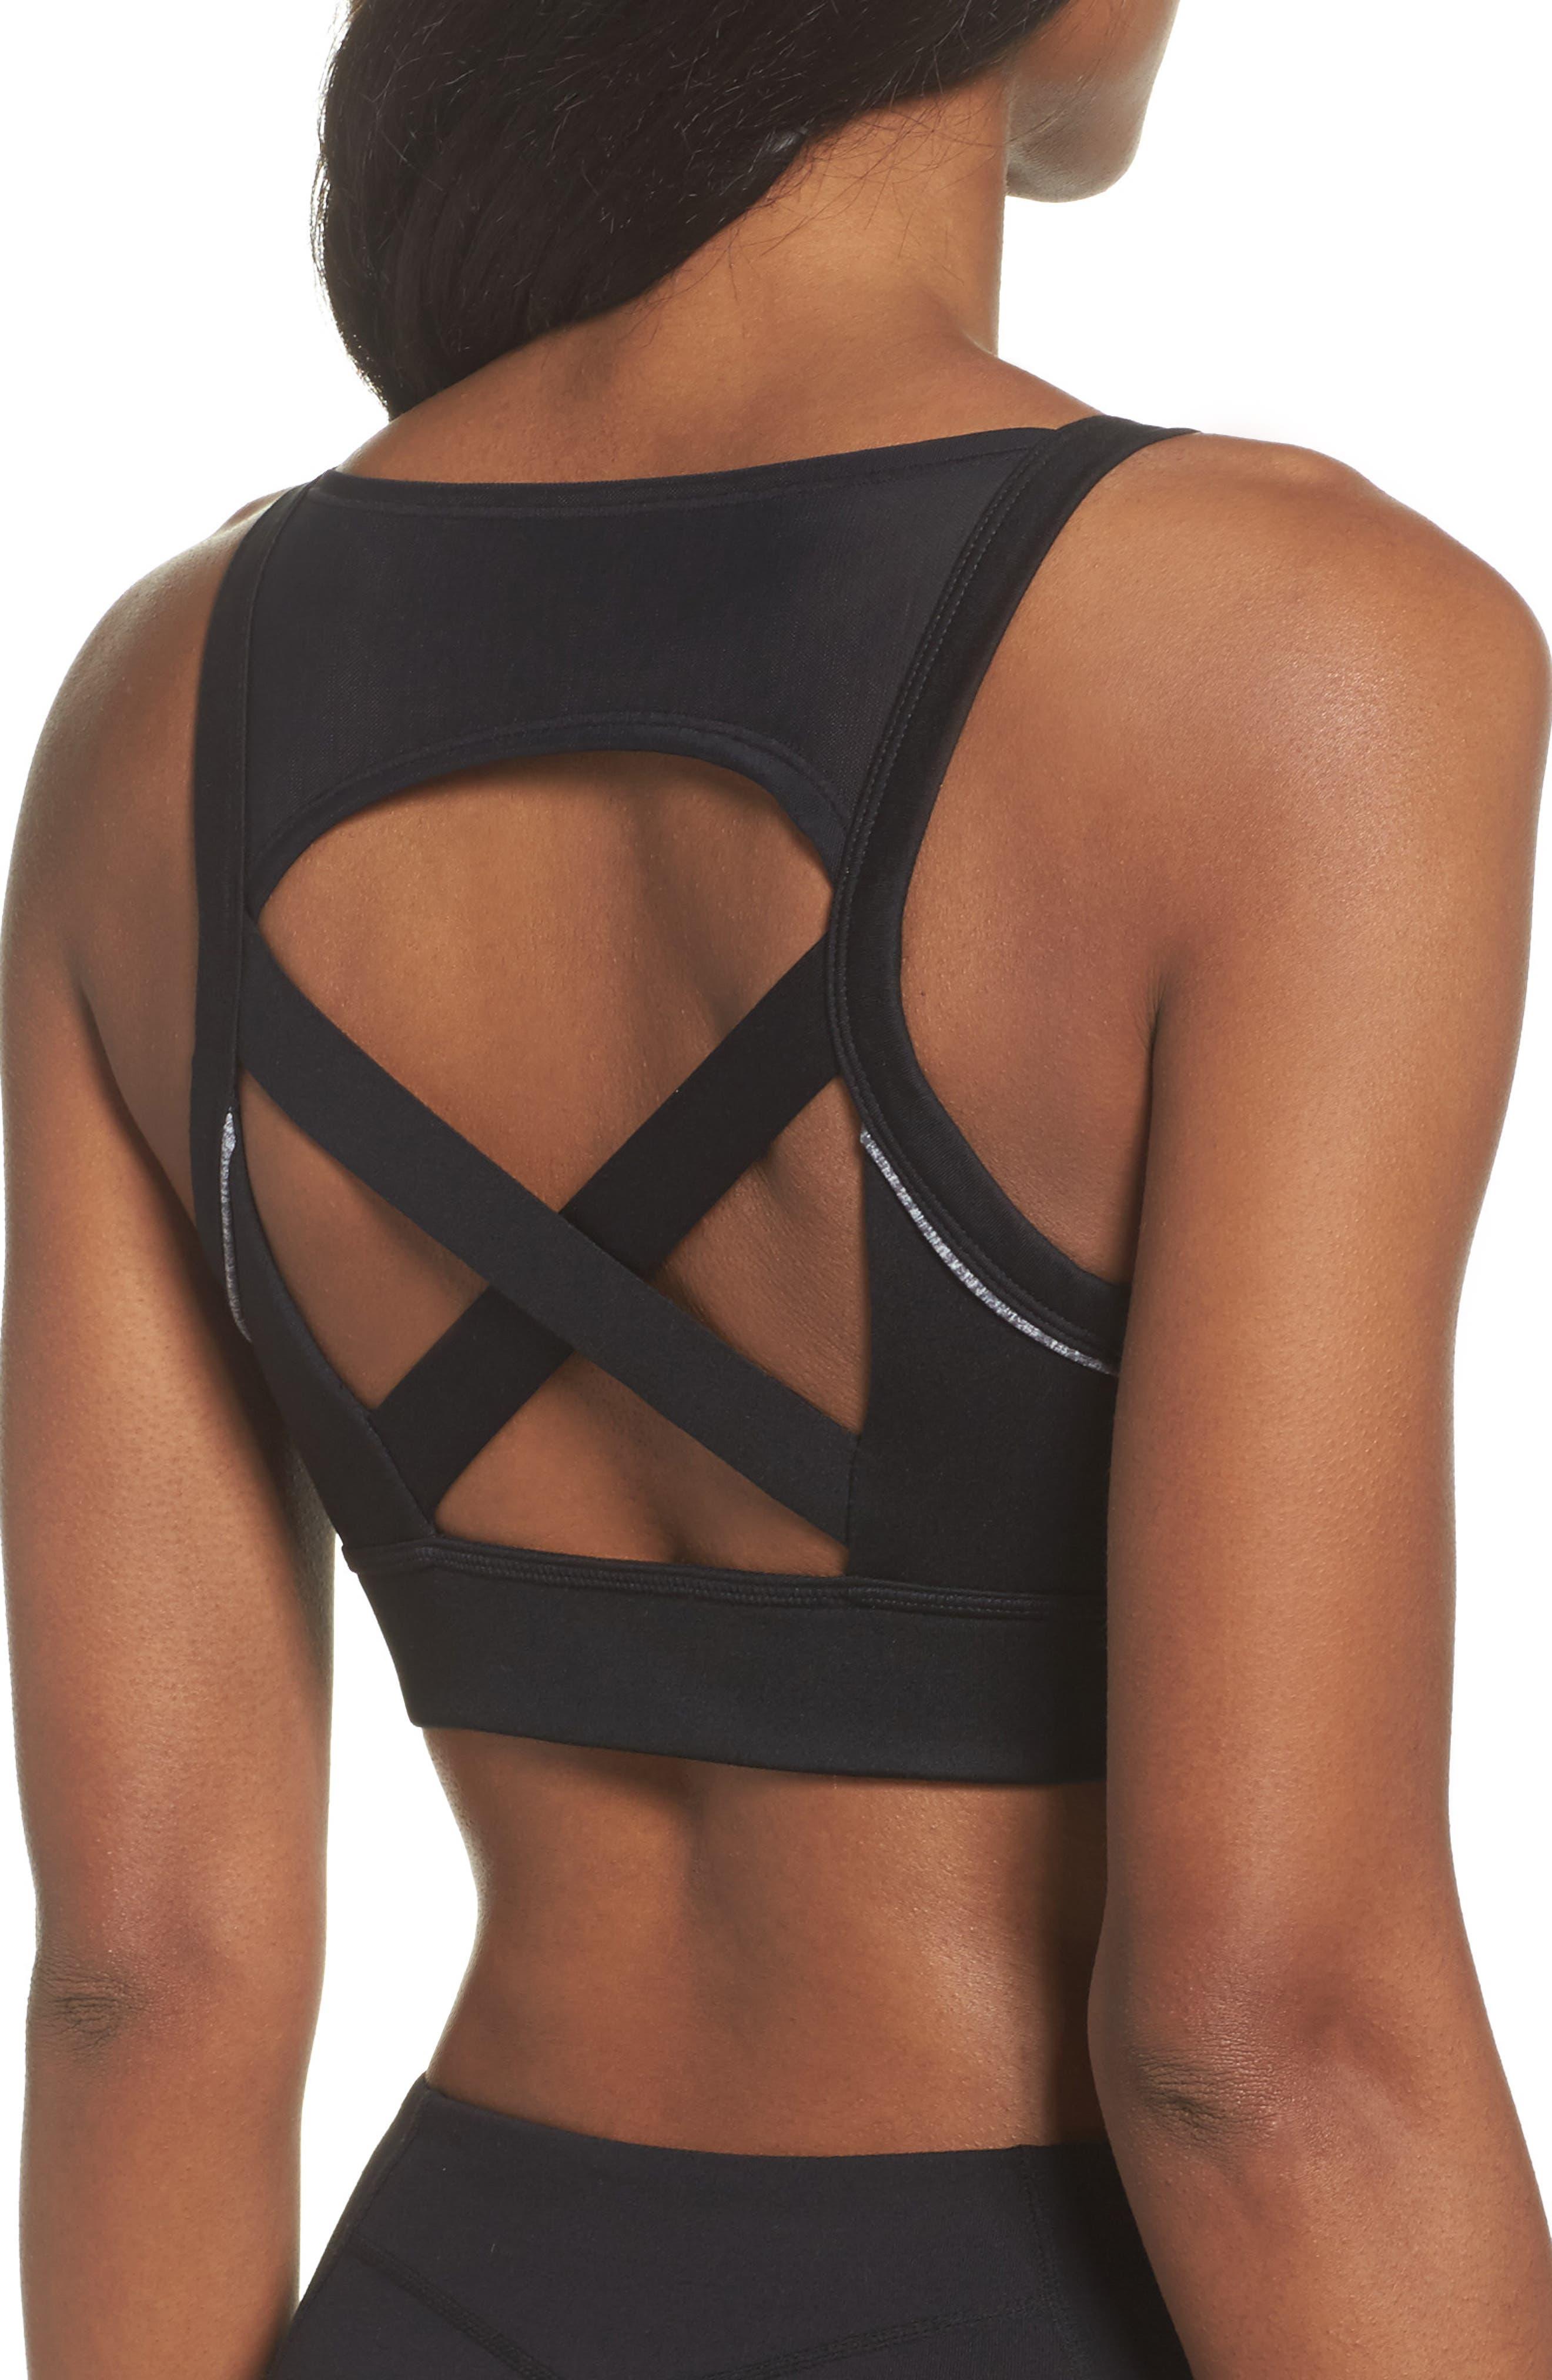 Harness Sports Bra,                             Alternate thumbnail 2, color,                             Black